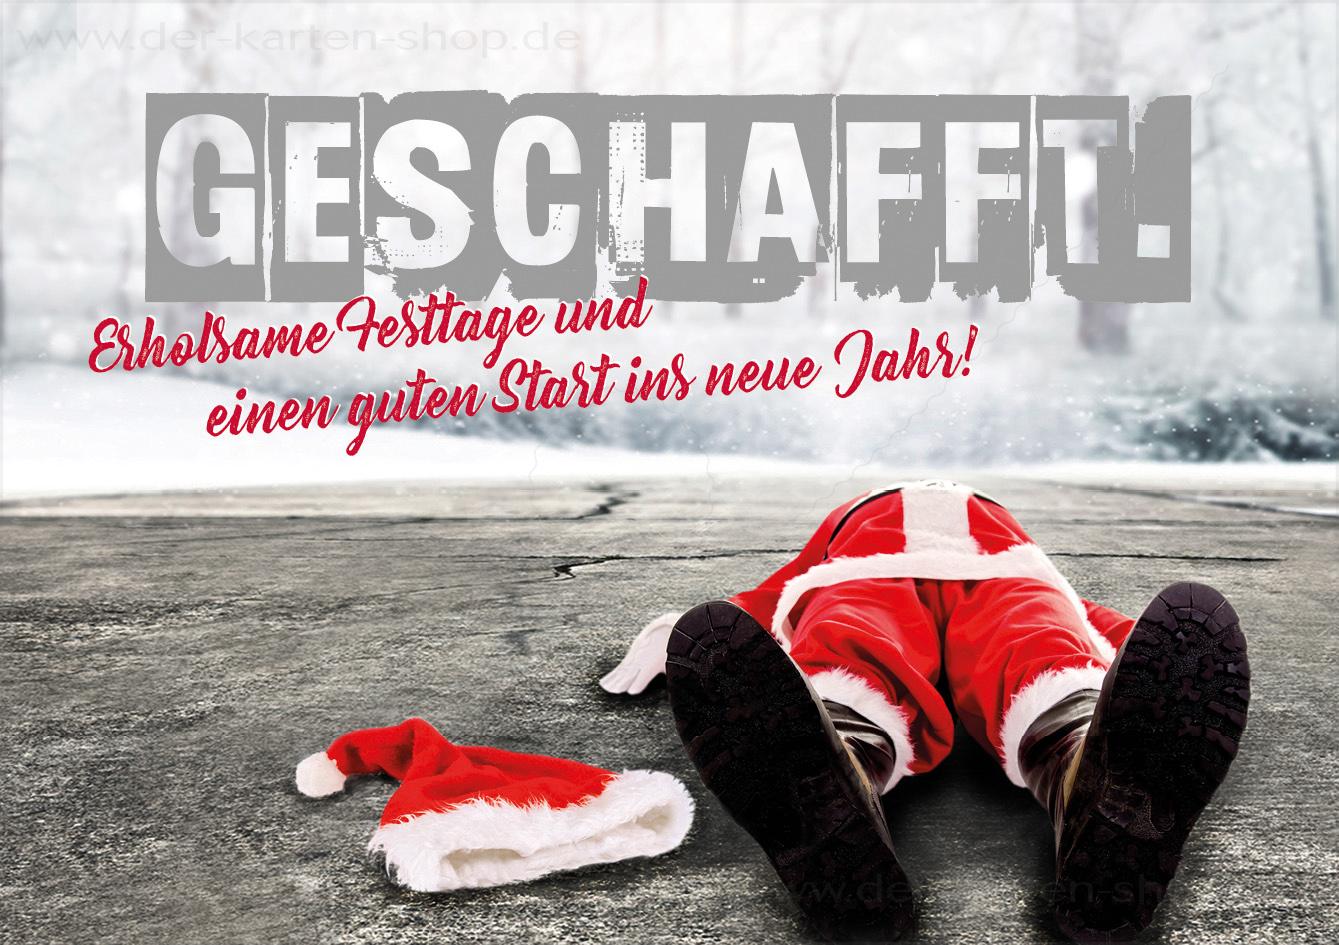 Doppelkarte weihnachten platter nikolaus weihnachtsmann 39 geschafft 39 doppelkarten weihnachten - Weihnachtskarten shop ...